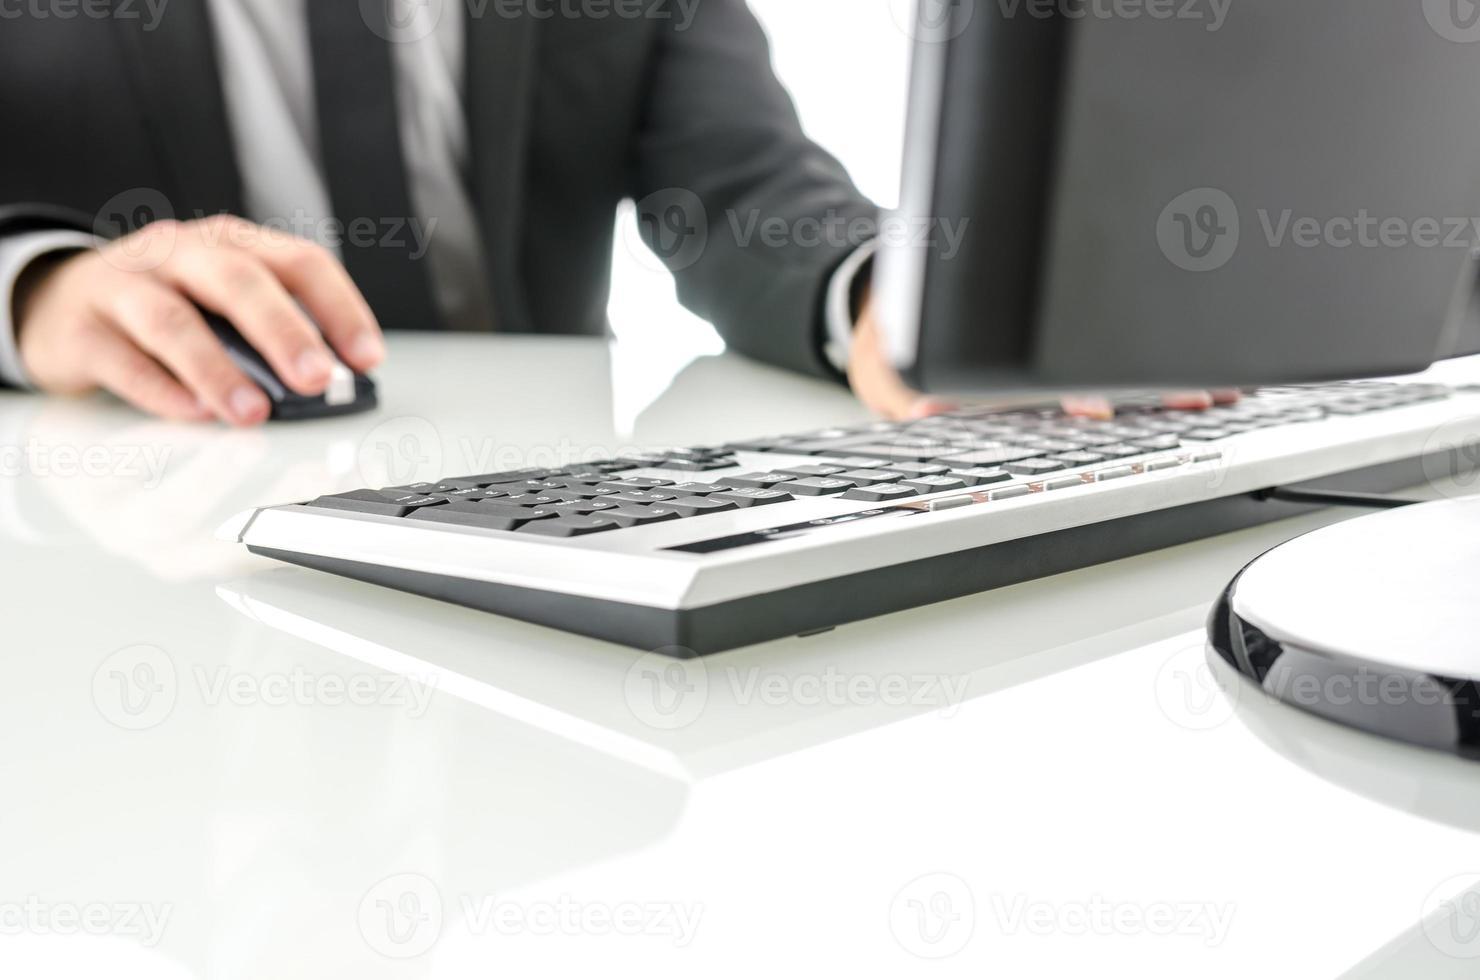 kontorsskrivbord foto